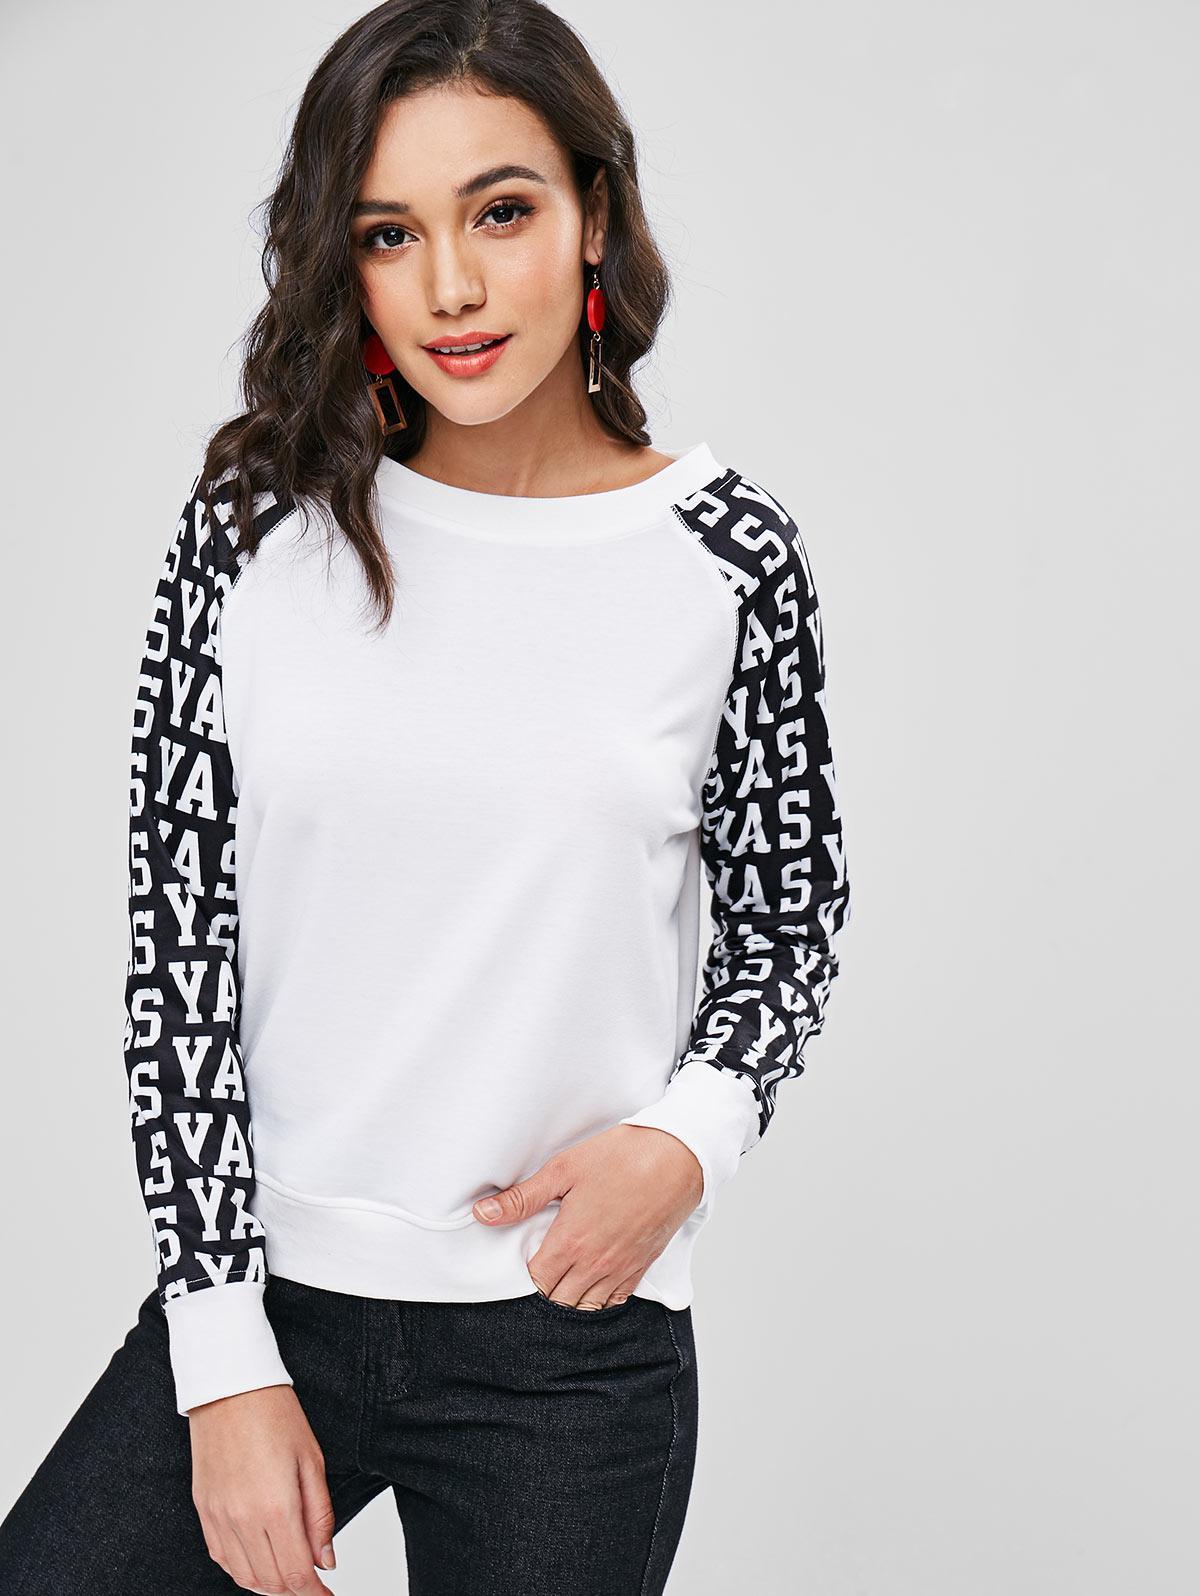 Two Tone Letter Graphic Sweatshirt, White